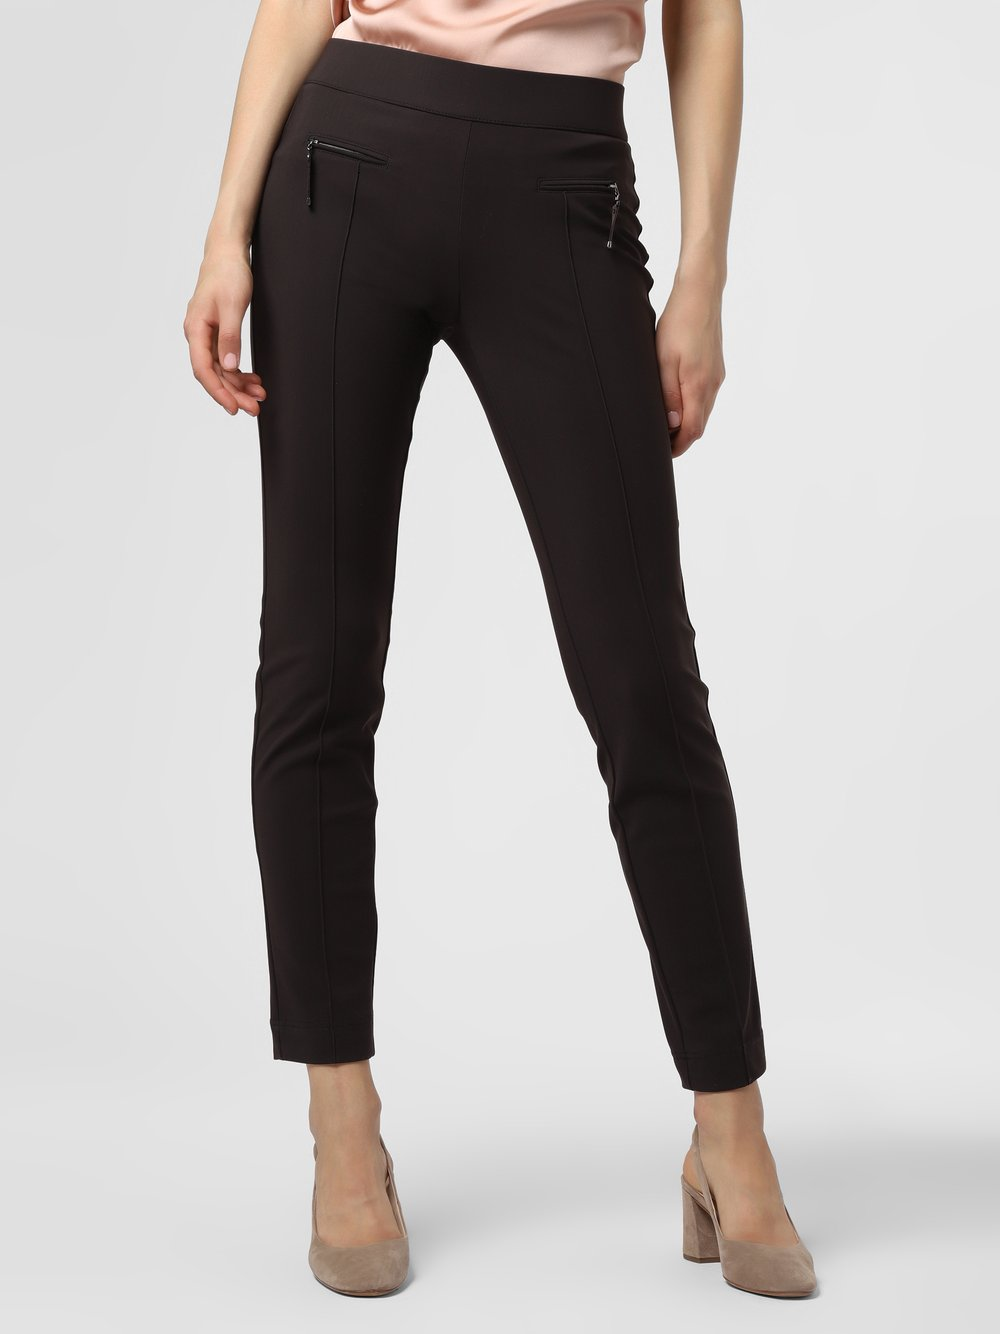 RAFFAELLO ROSSI – Spodnie damskie – Otti, brązowy Van Graaf 483800-0001-00420